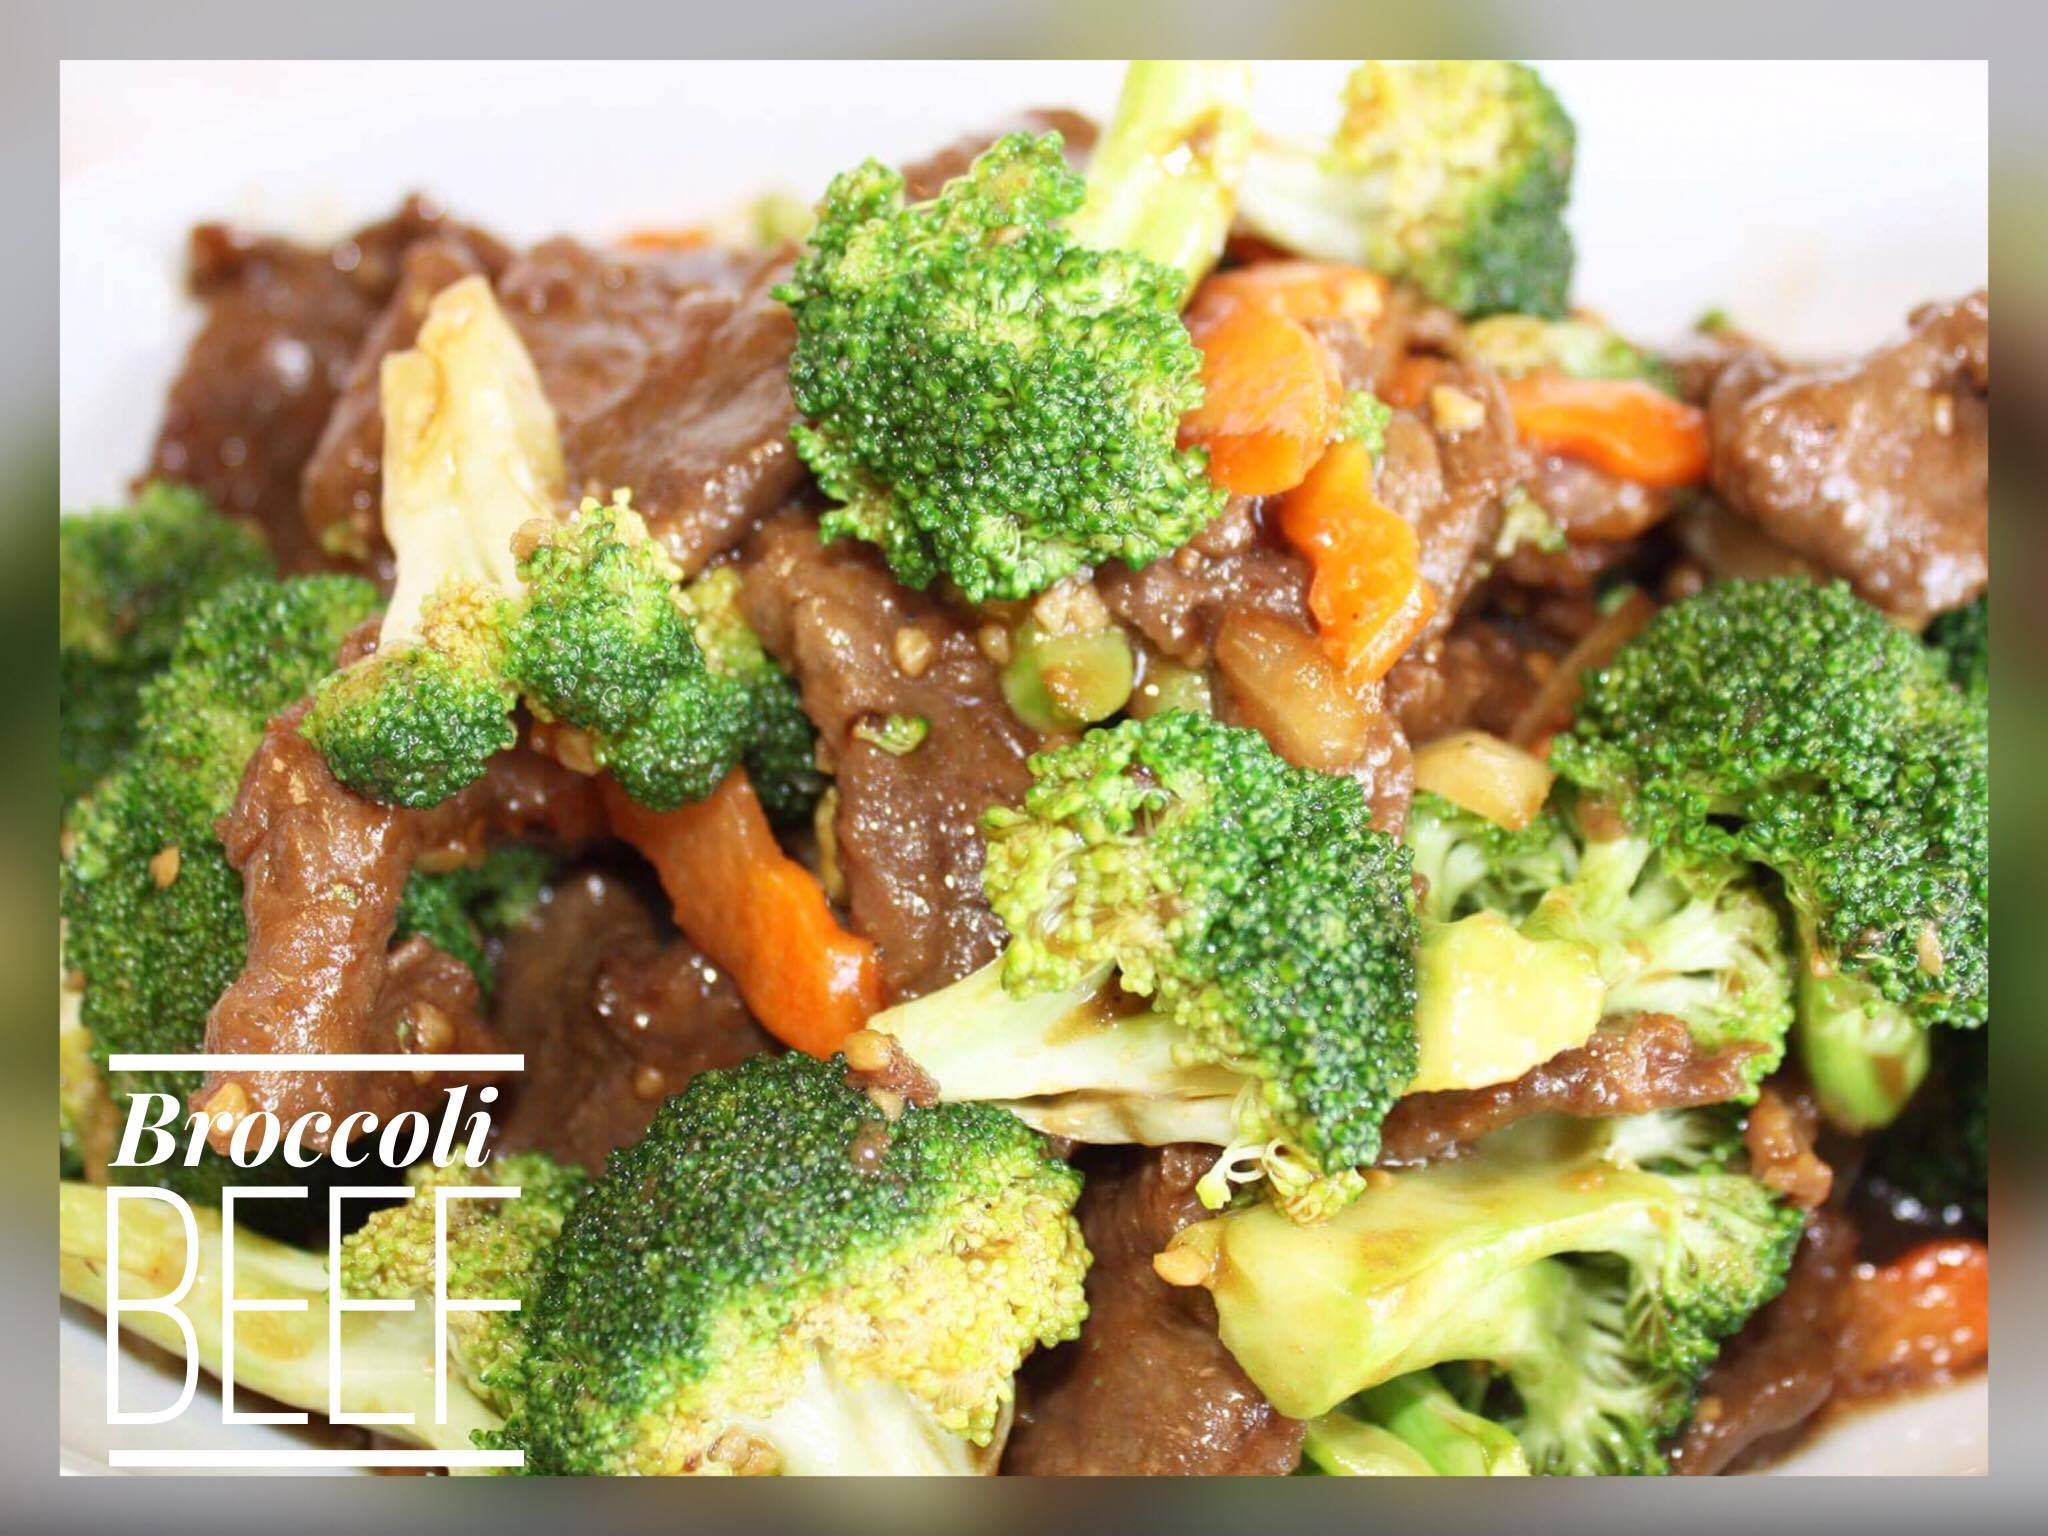 broccolibeef copy.jpg